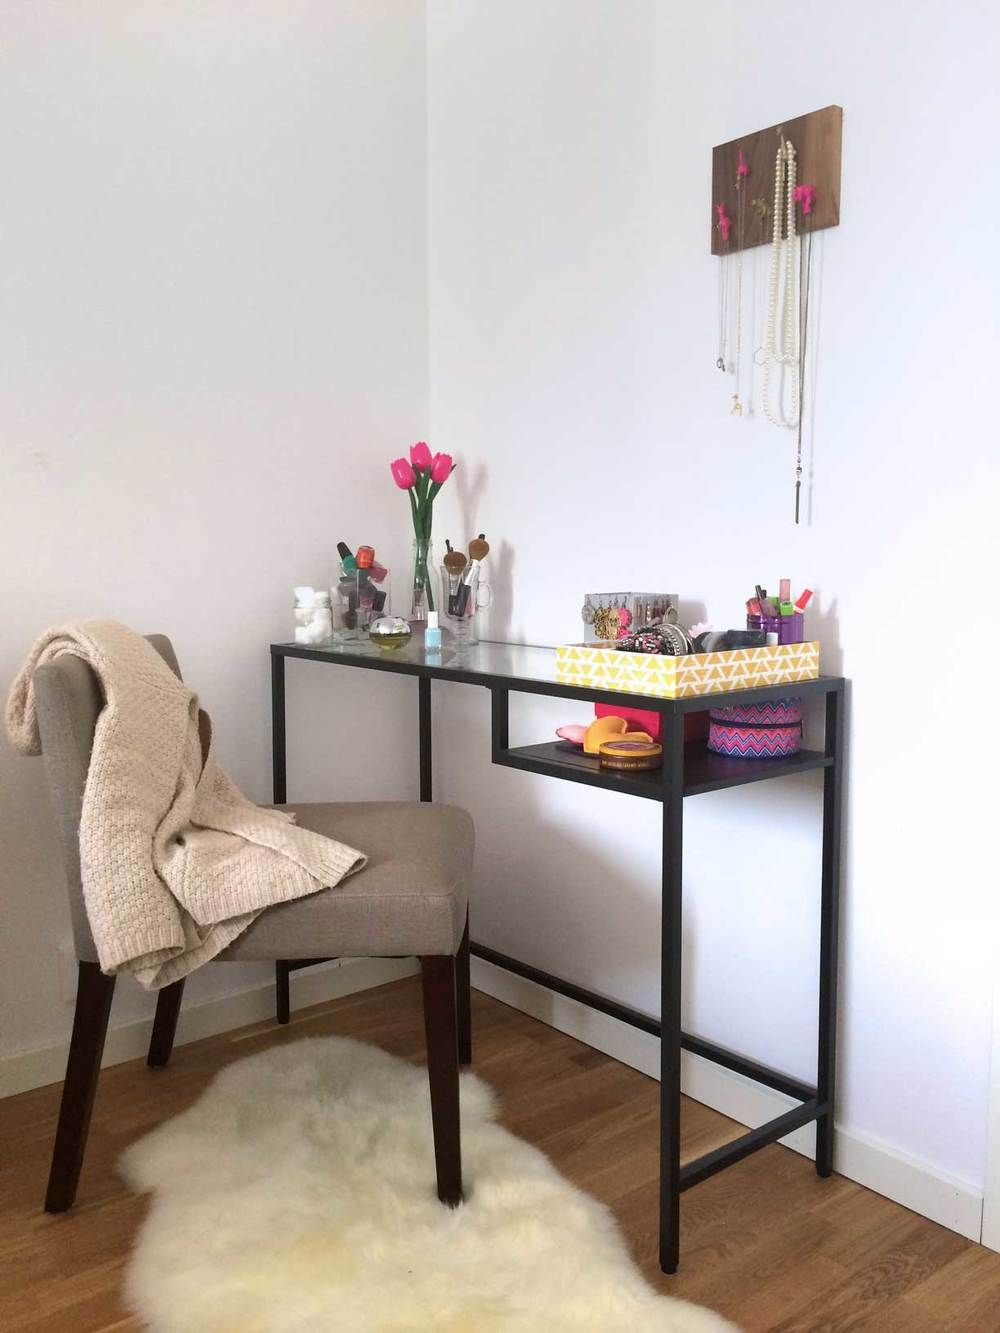 Ikea stuhl jules : Ikea laptop table vittsjo google search favorite places